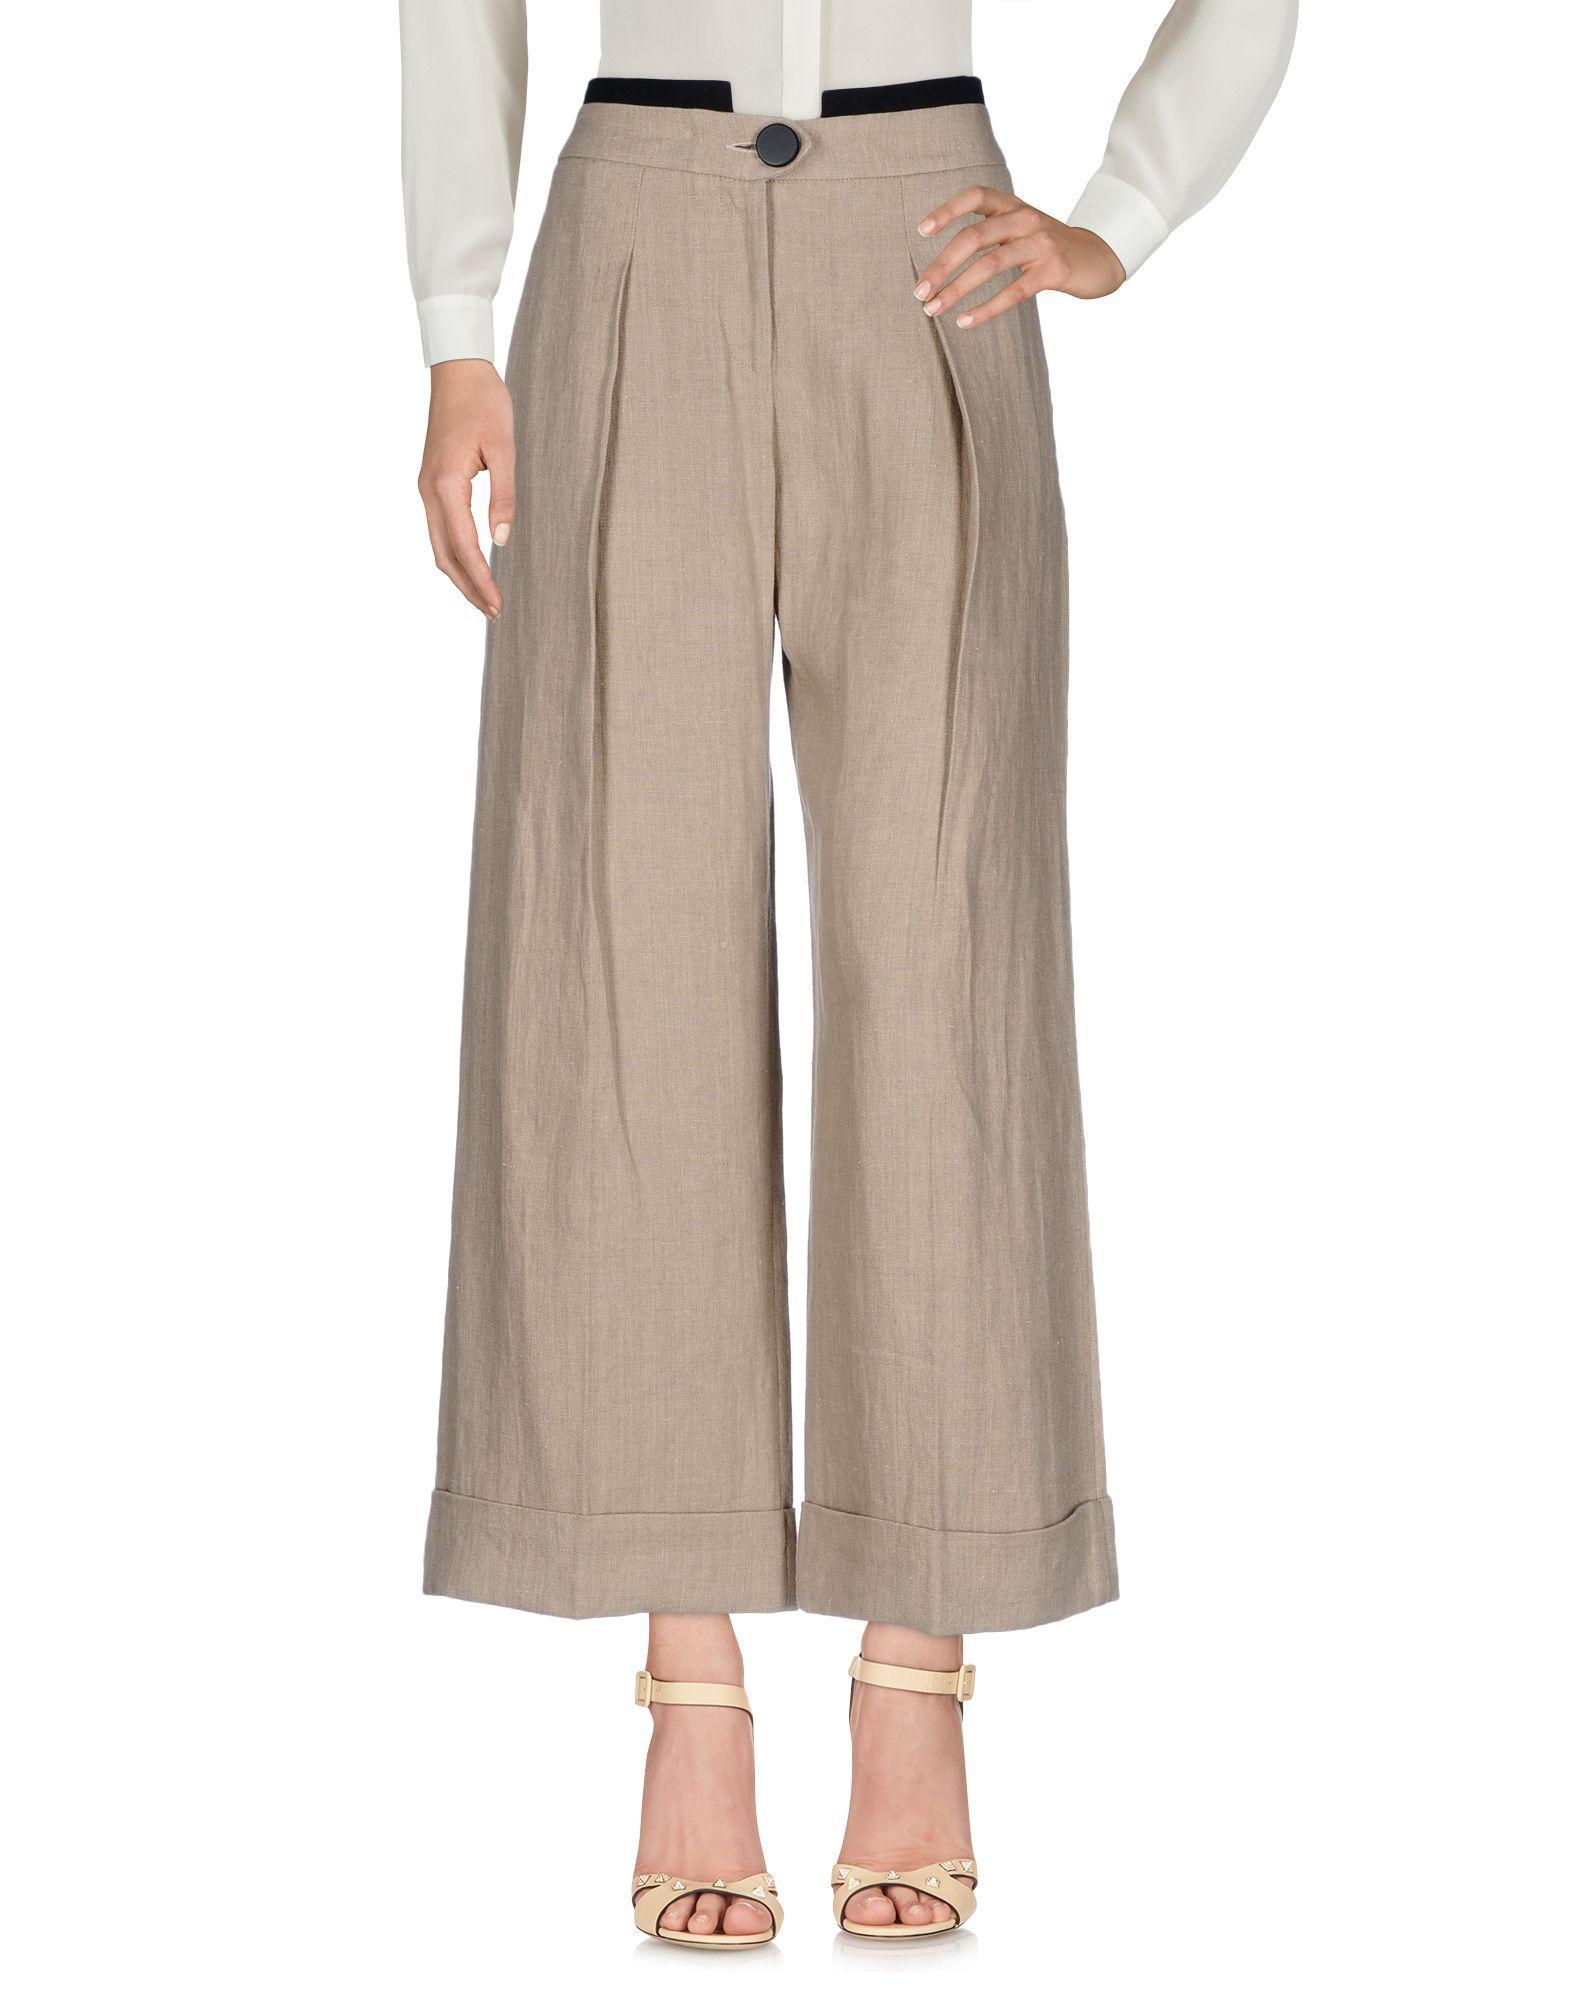 Tara Jarmon In Sand ModeSens Women pants casual, Tara